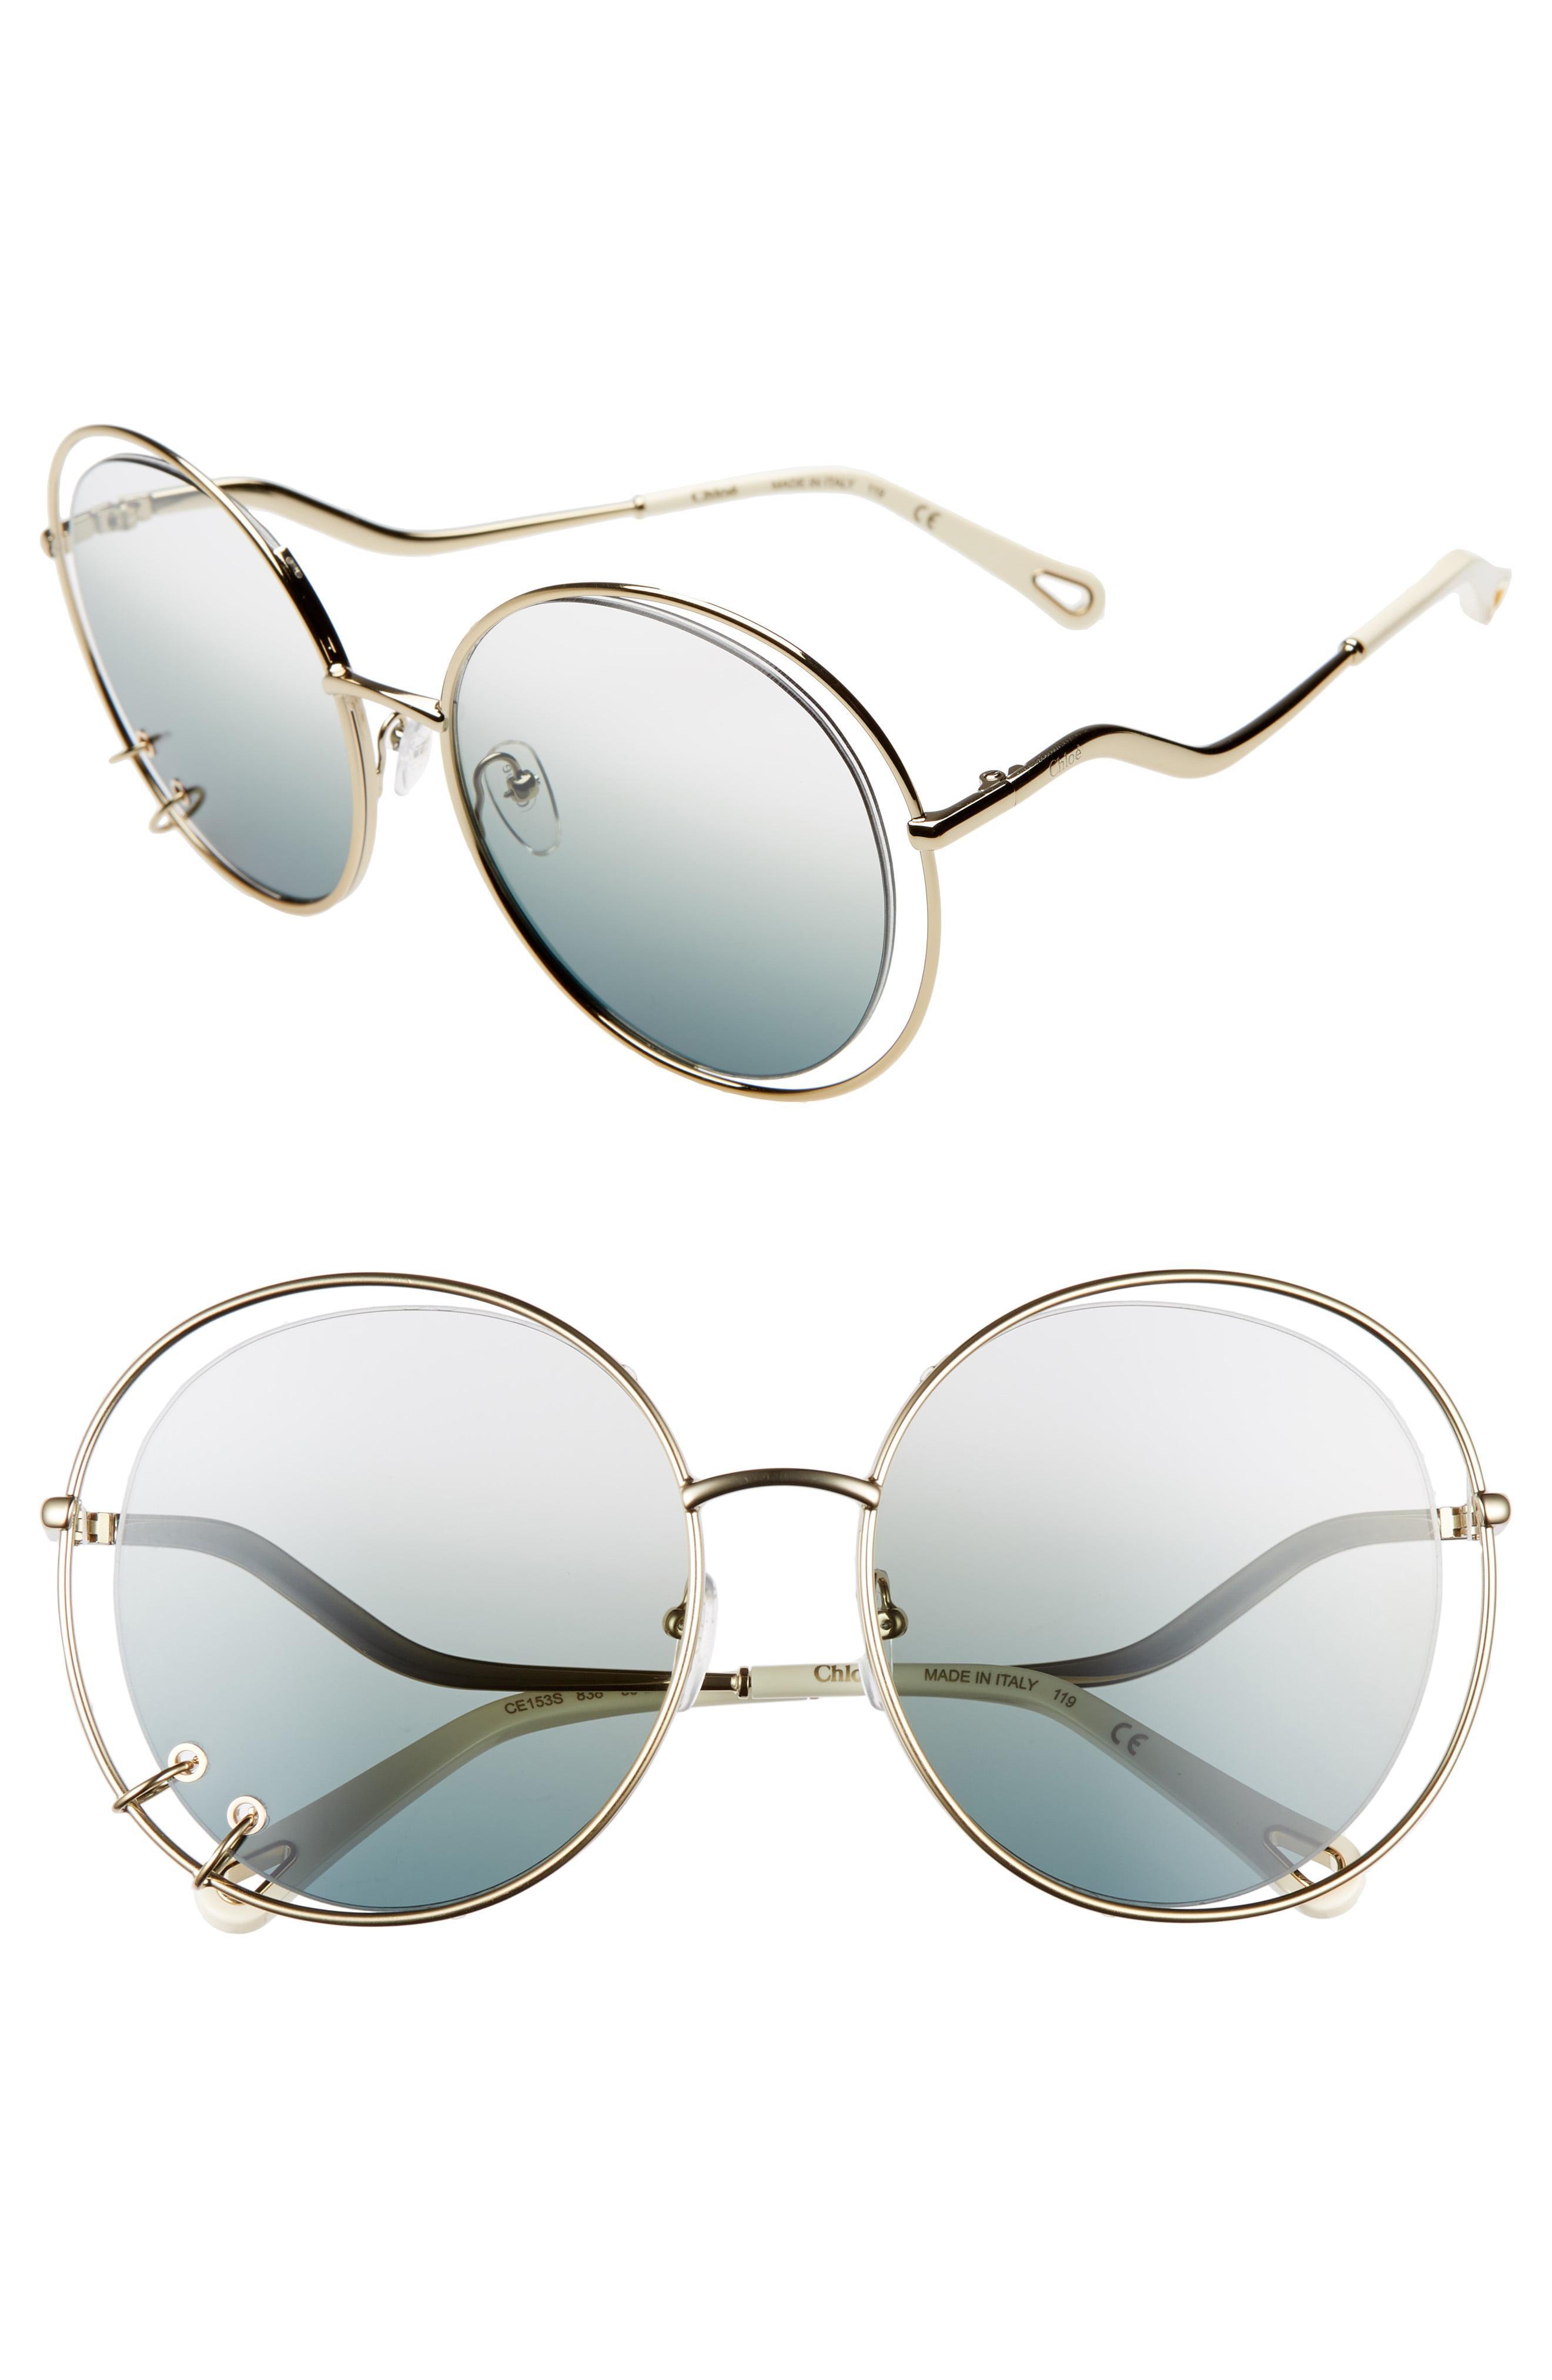 fab47dba512c Lyst - Chloé Wendy 59mm Round Sunglasses in Metallic